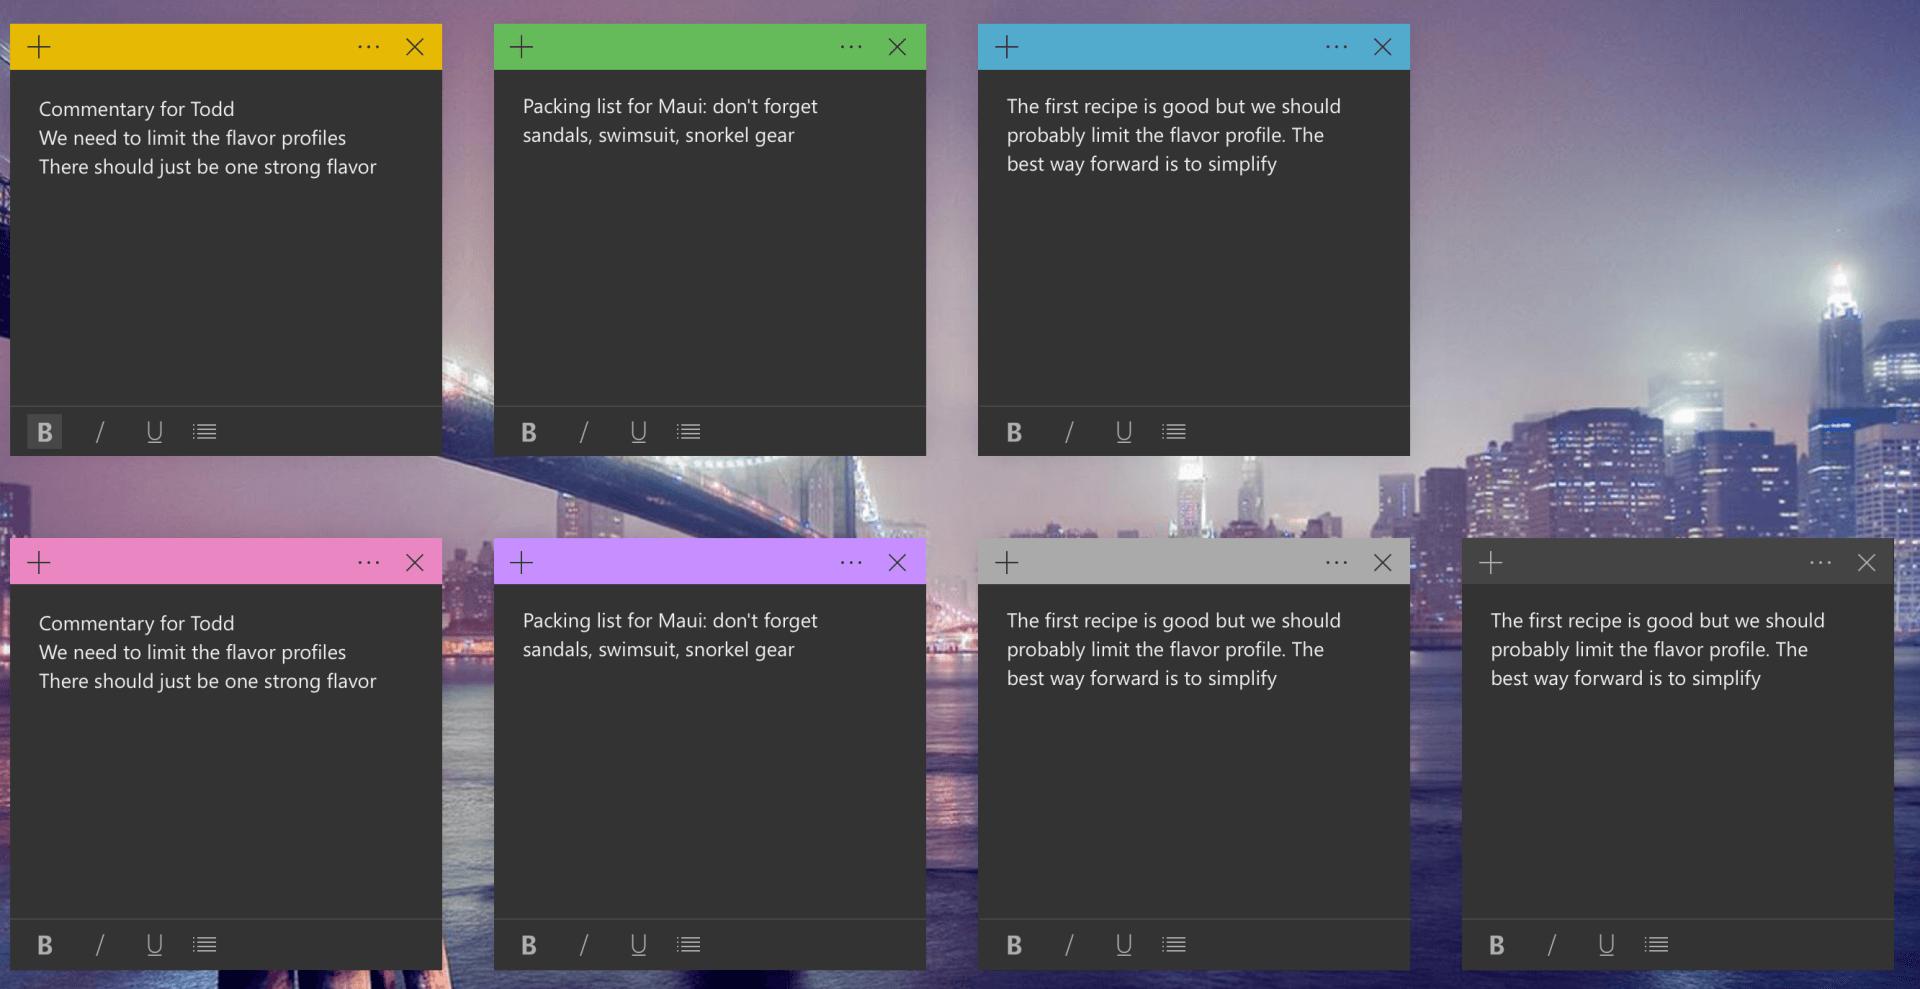 Windows 10 Build 18272 (19H1)